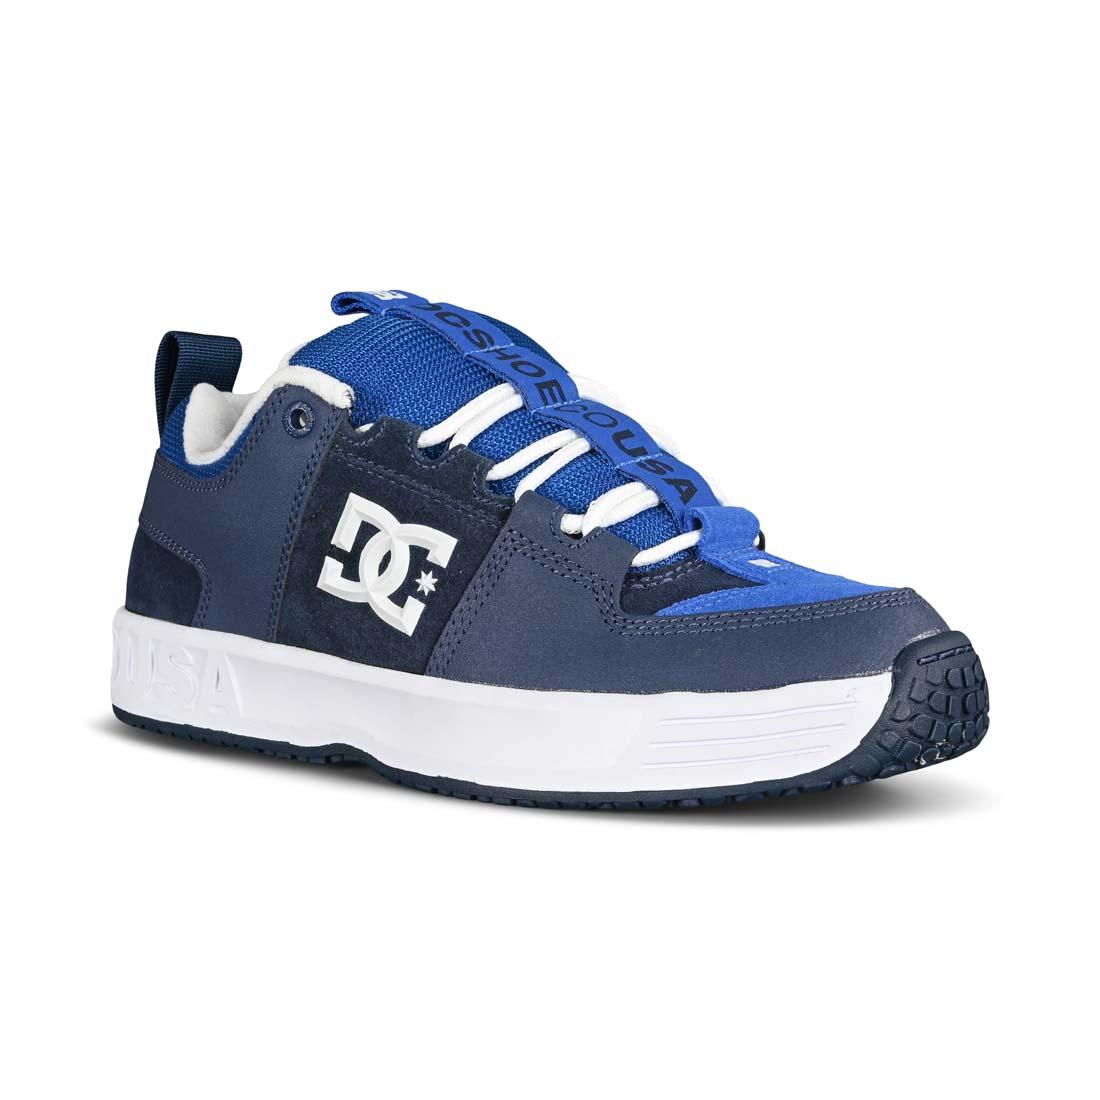 DC Shoes Lynx OG - Navy | Supereight.net